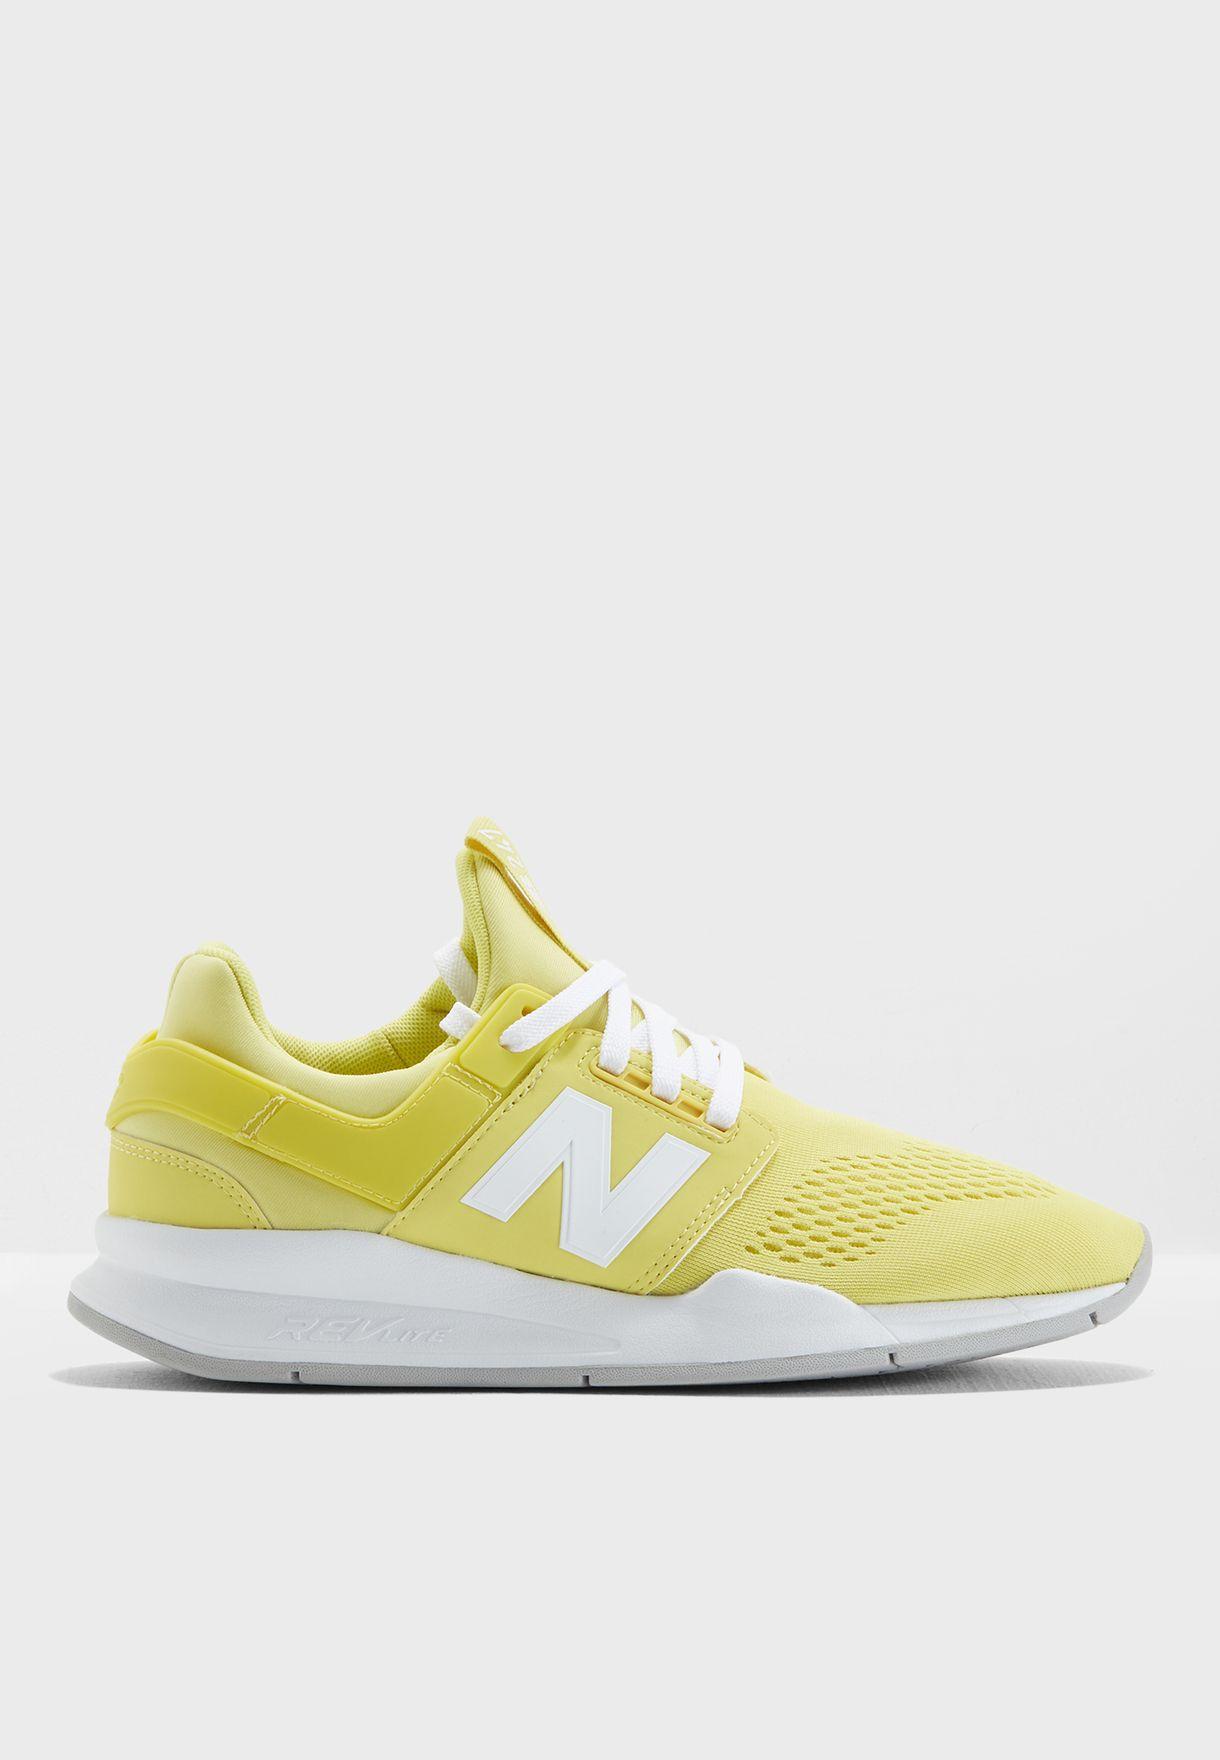 226ca68a5 تسوق حذاء رياضي 247 ماركة نيو بالانس لون أصفر WS247UG في السعودية ...